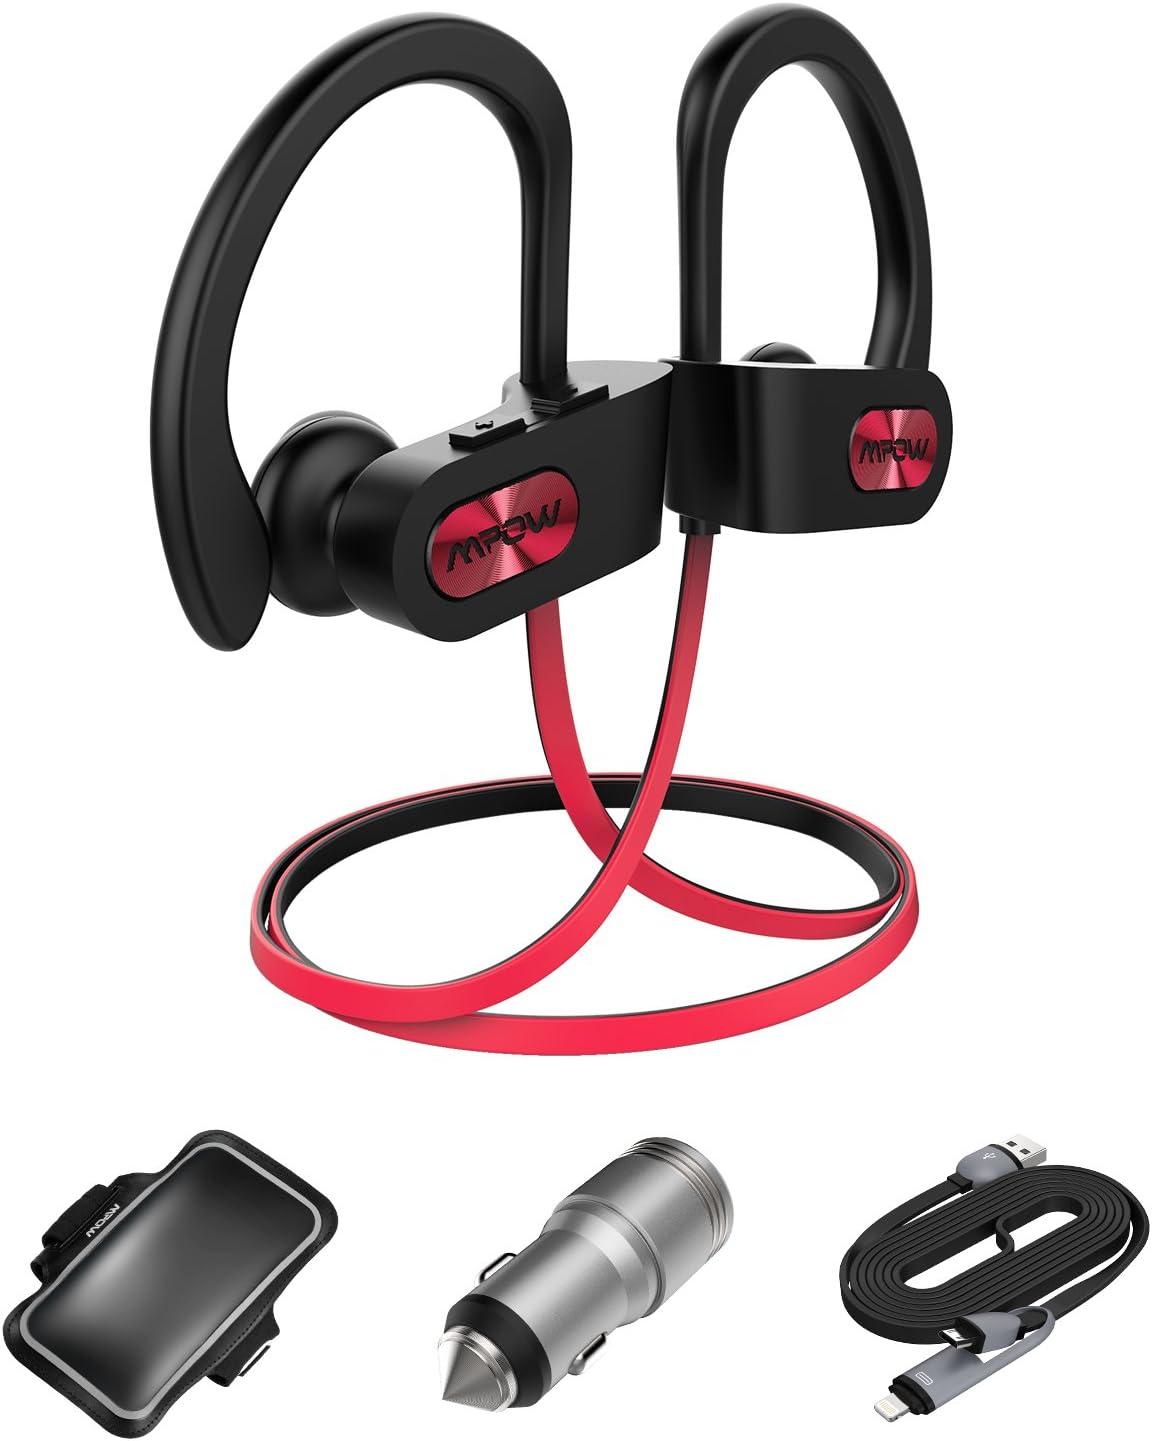 Cheetah Sport Mpow Aukson 4,1 auriculares estéreo inalámbricos ...